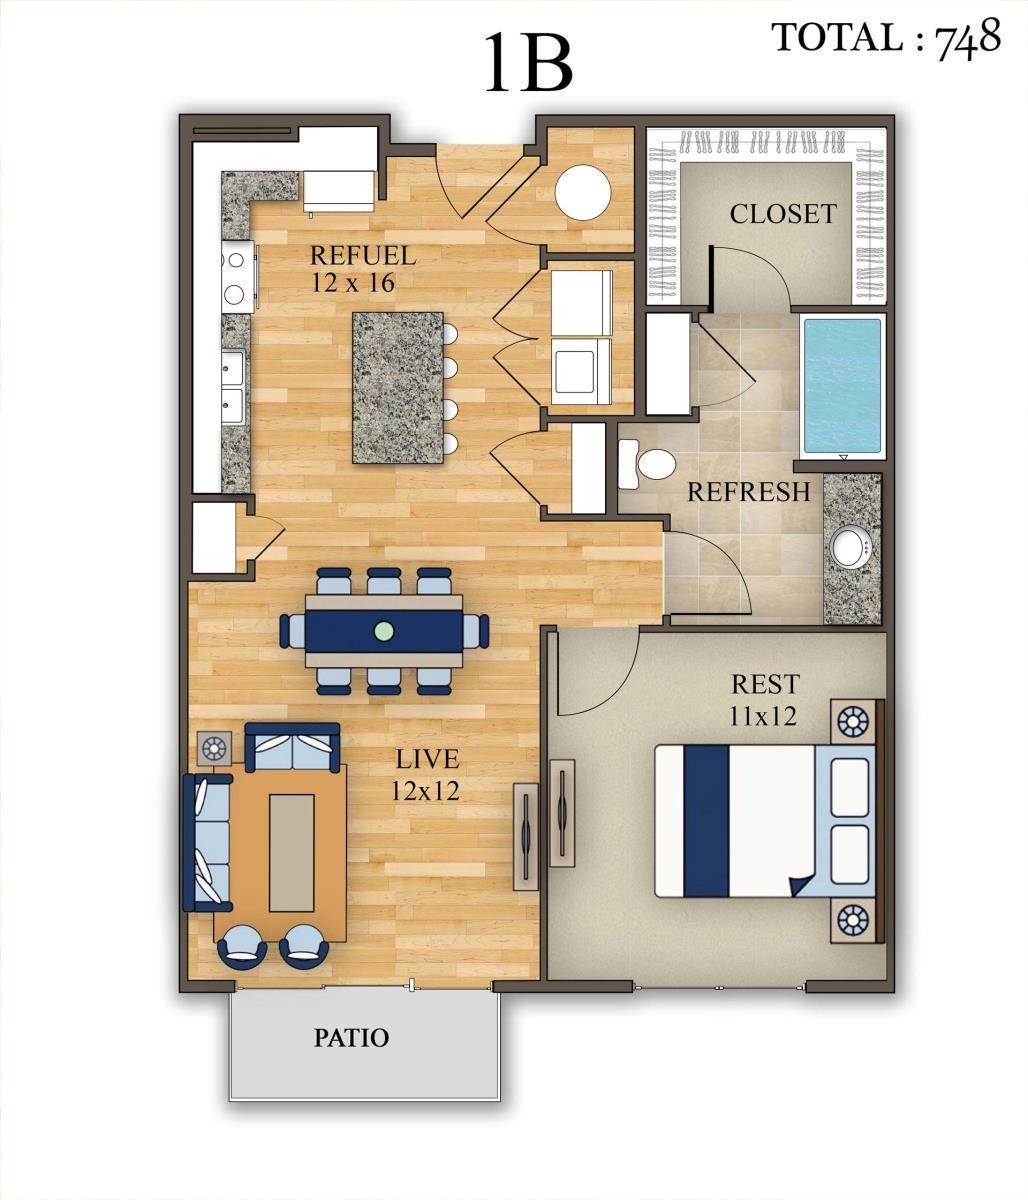 748 sq. ft. 1B floor plan